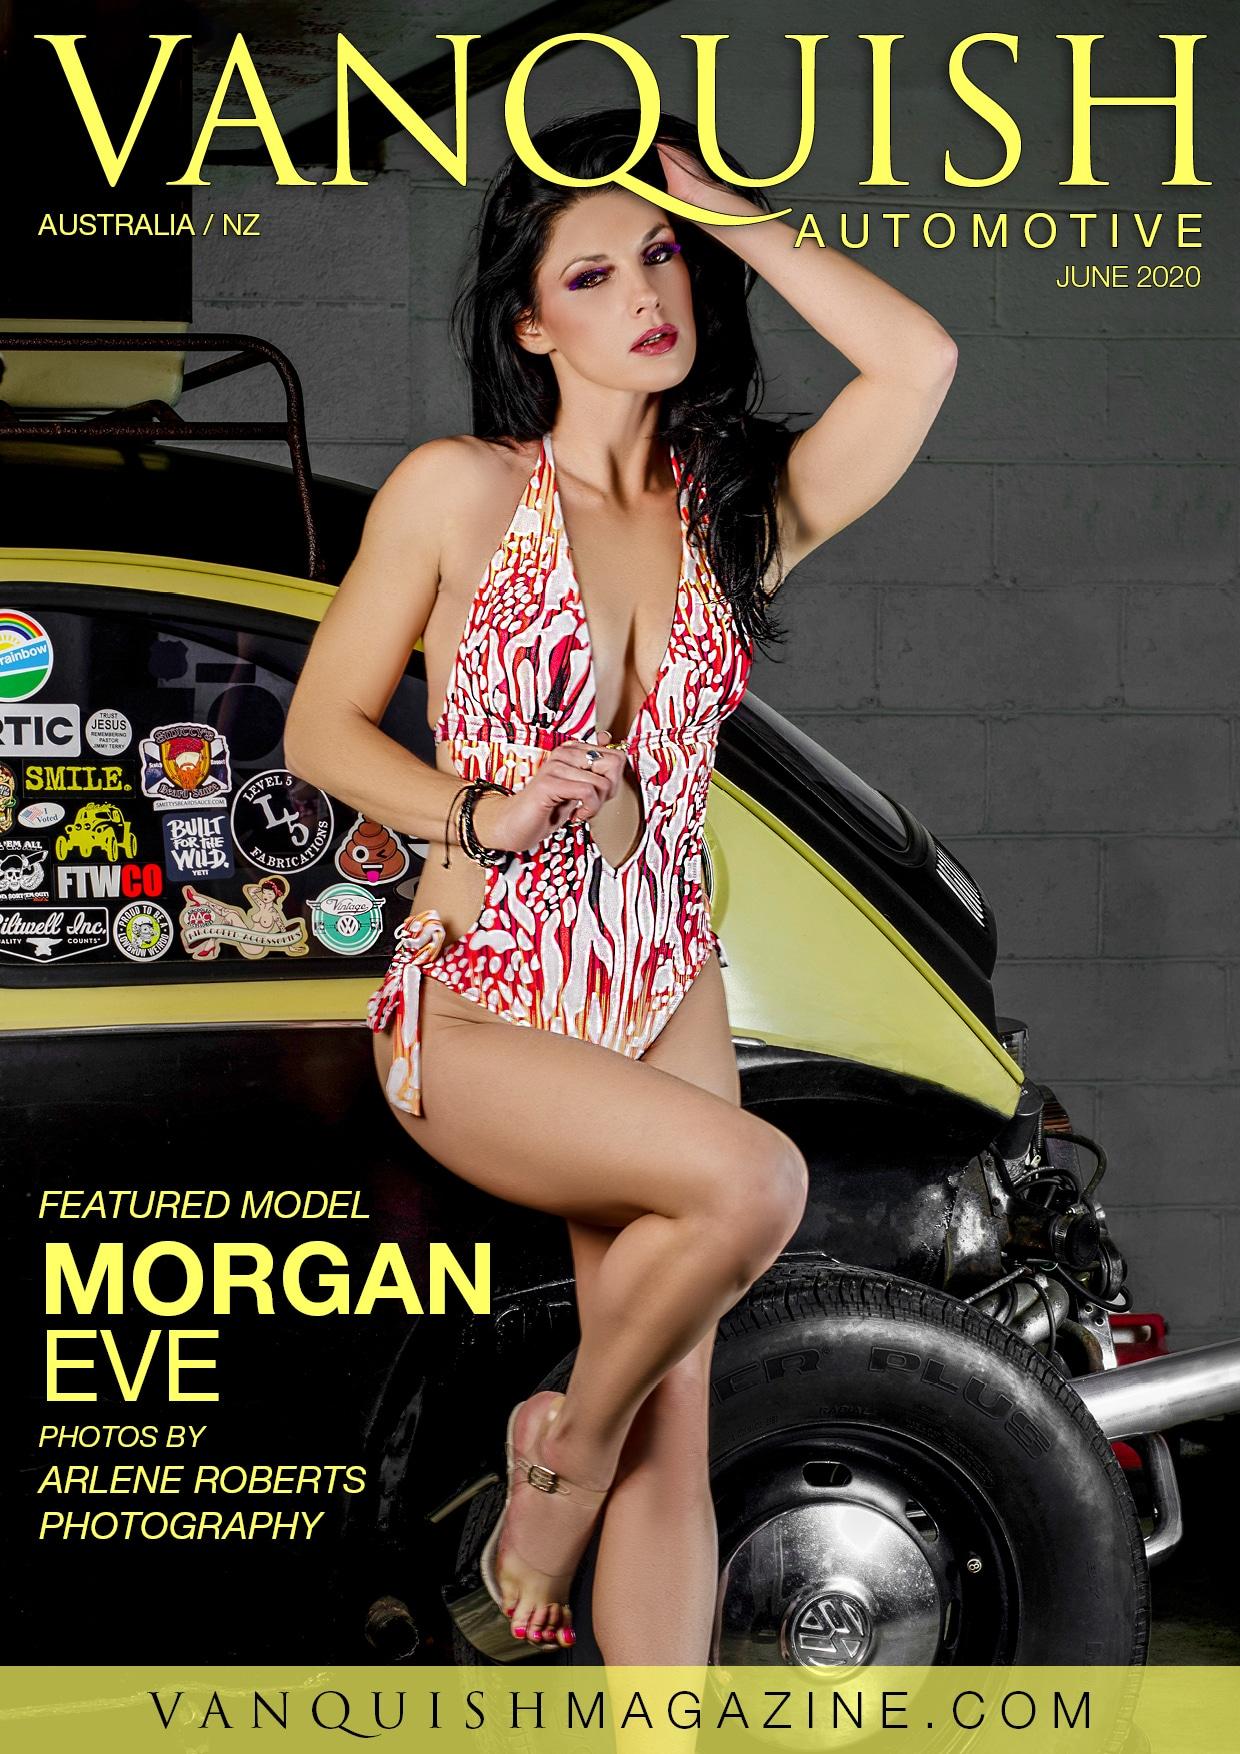 Vanquish Automotive - June 2020 - Morgan Eve